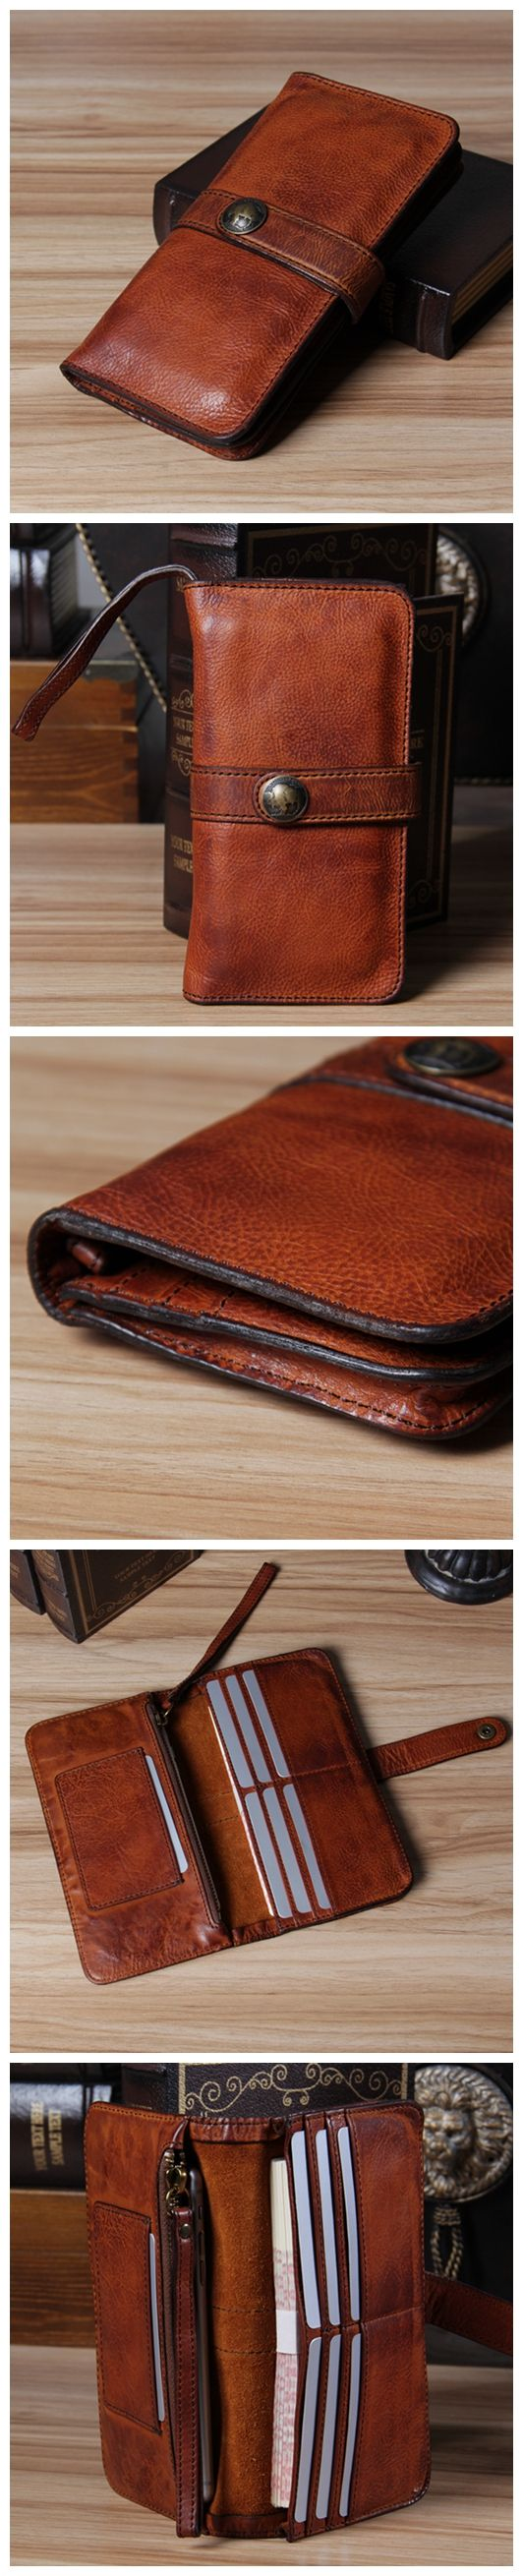 Men's Vintage Look Genuine Leather Long Bifold Wallet